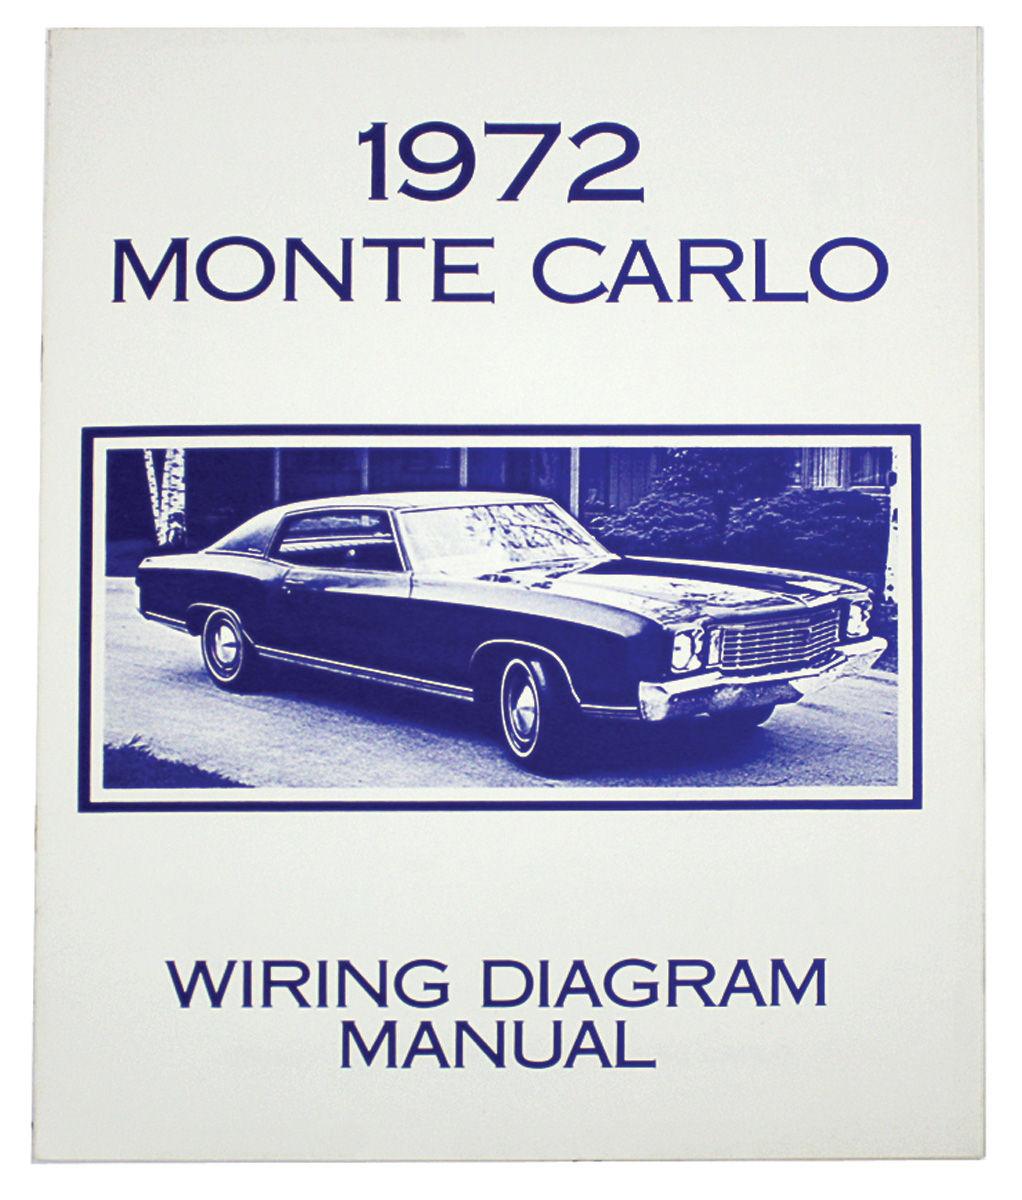 Monte Carlo Wiring Diagram Manuals Fits 1976 Monte Carlo @ OPGI